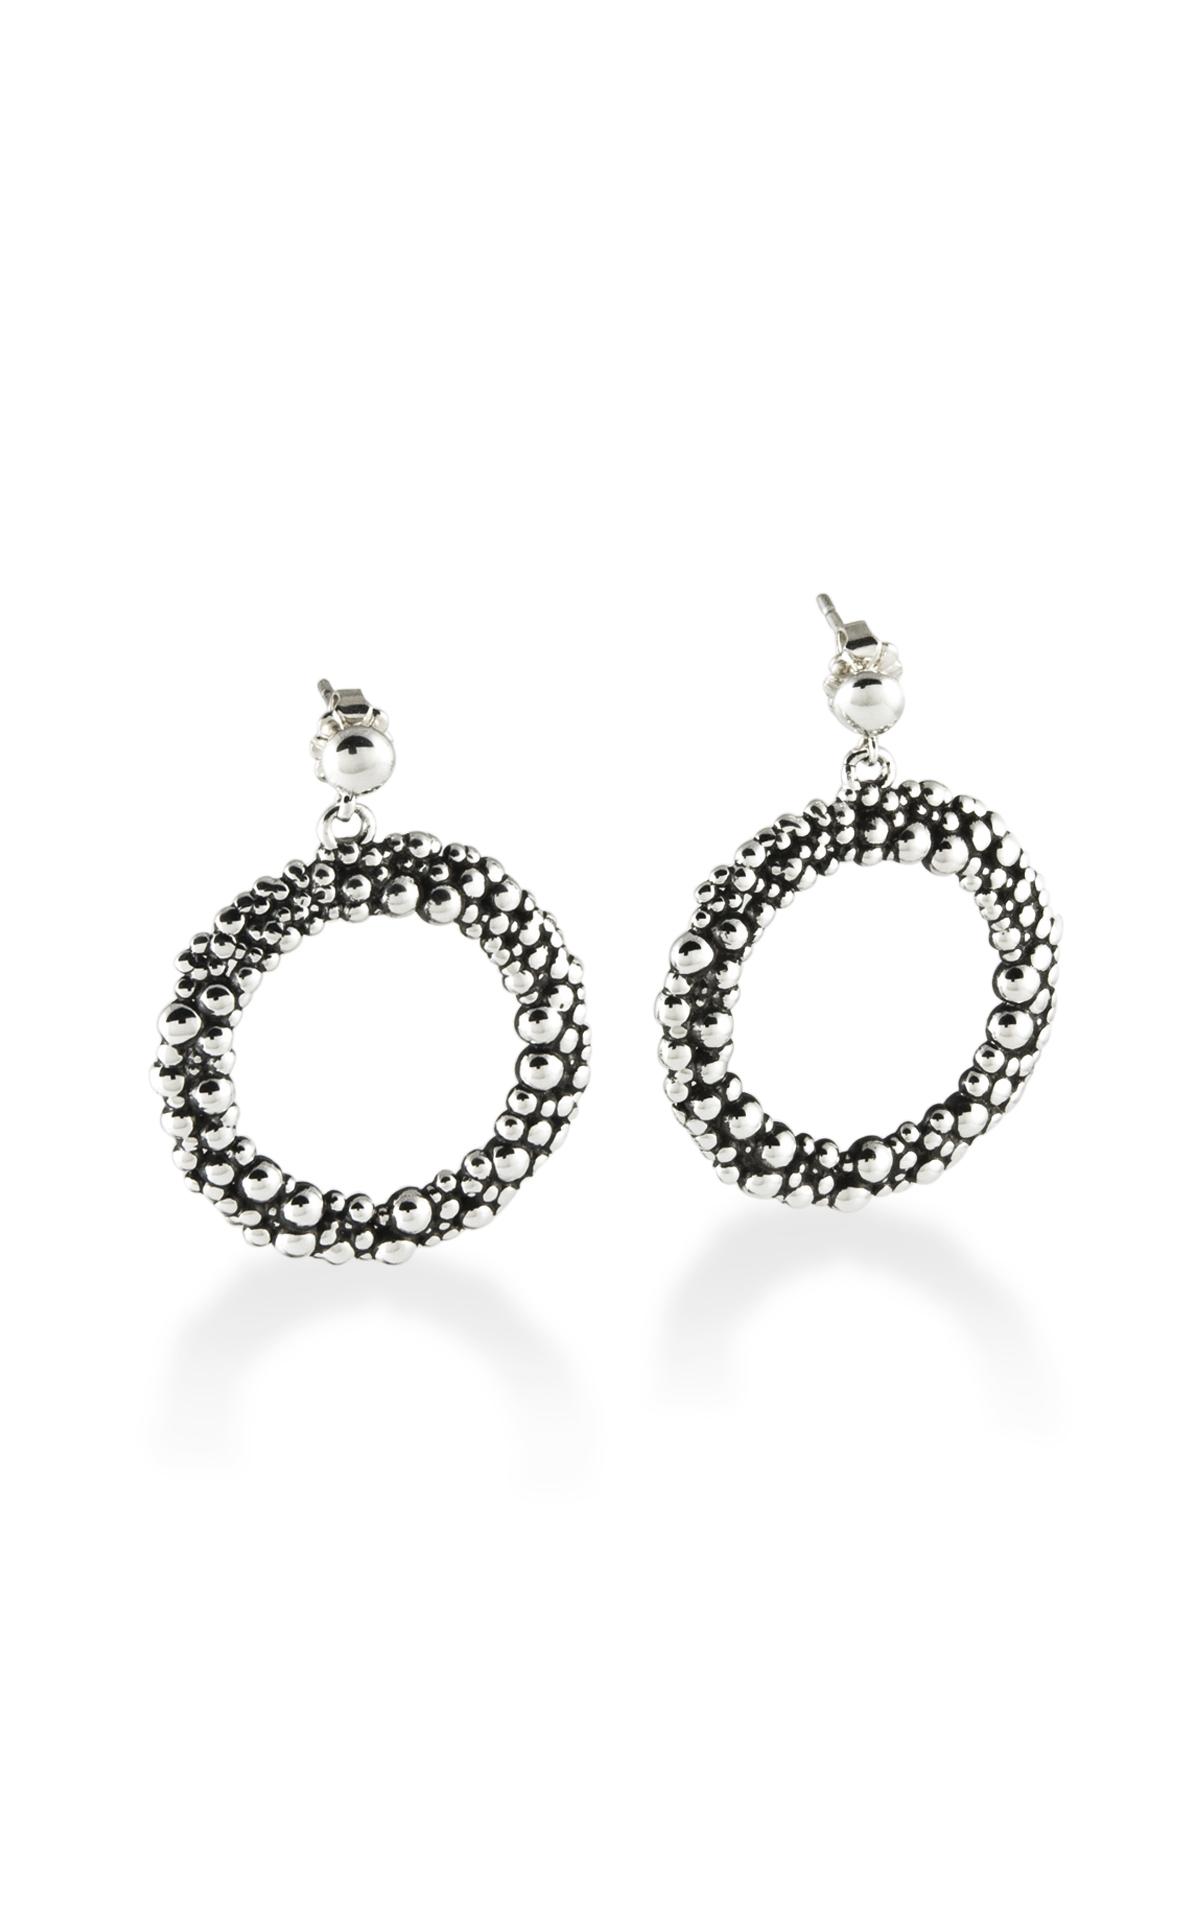 Zina Rain Earrings B1475 product image